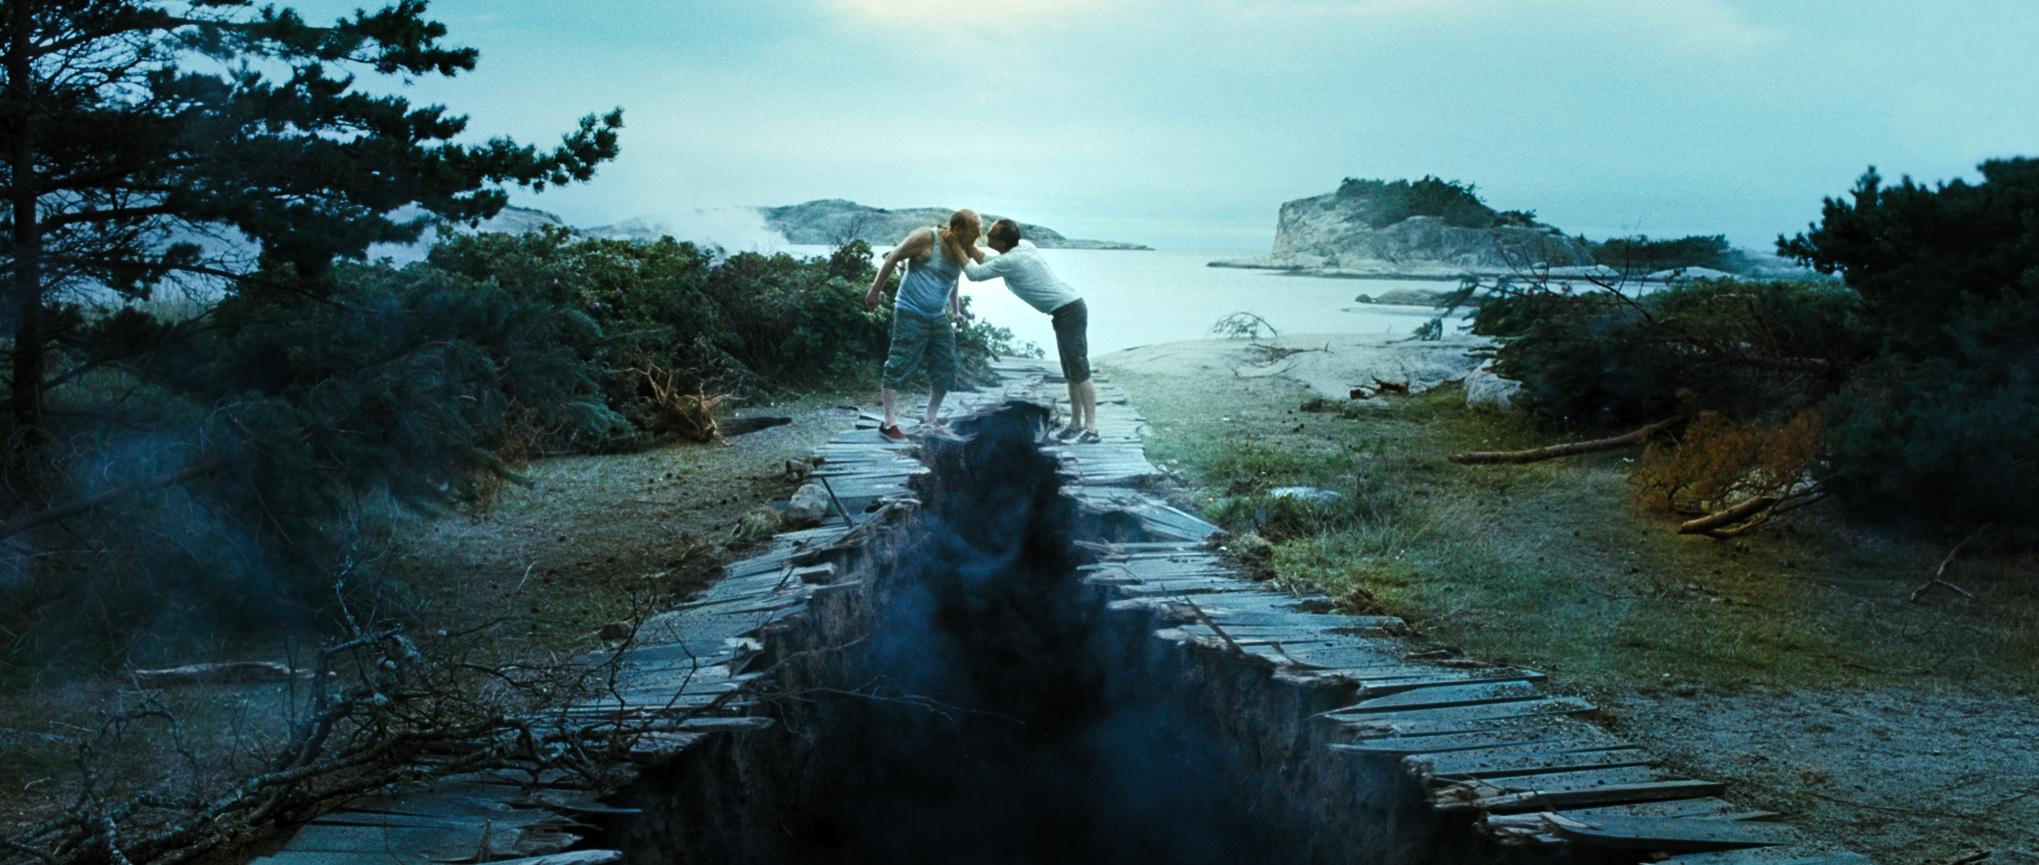 Ingar Helge Gimle og Jon Øigarden i «Mennesker i solen»